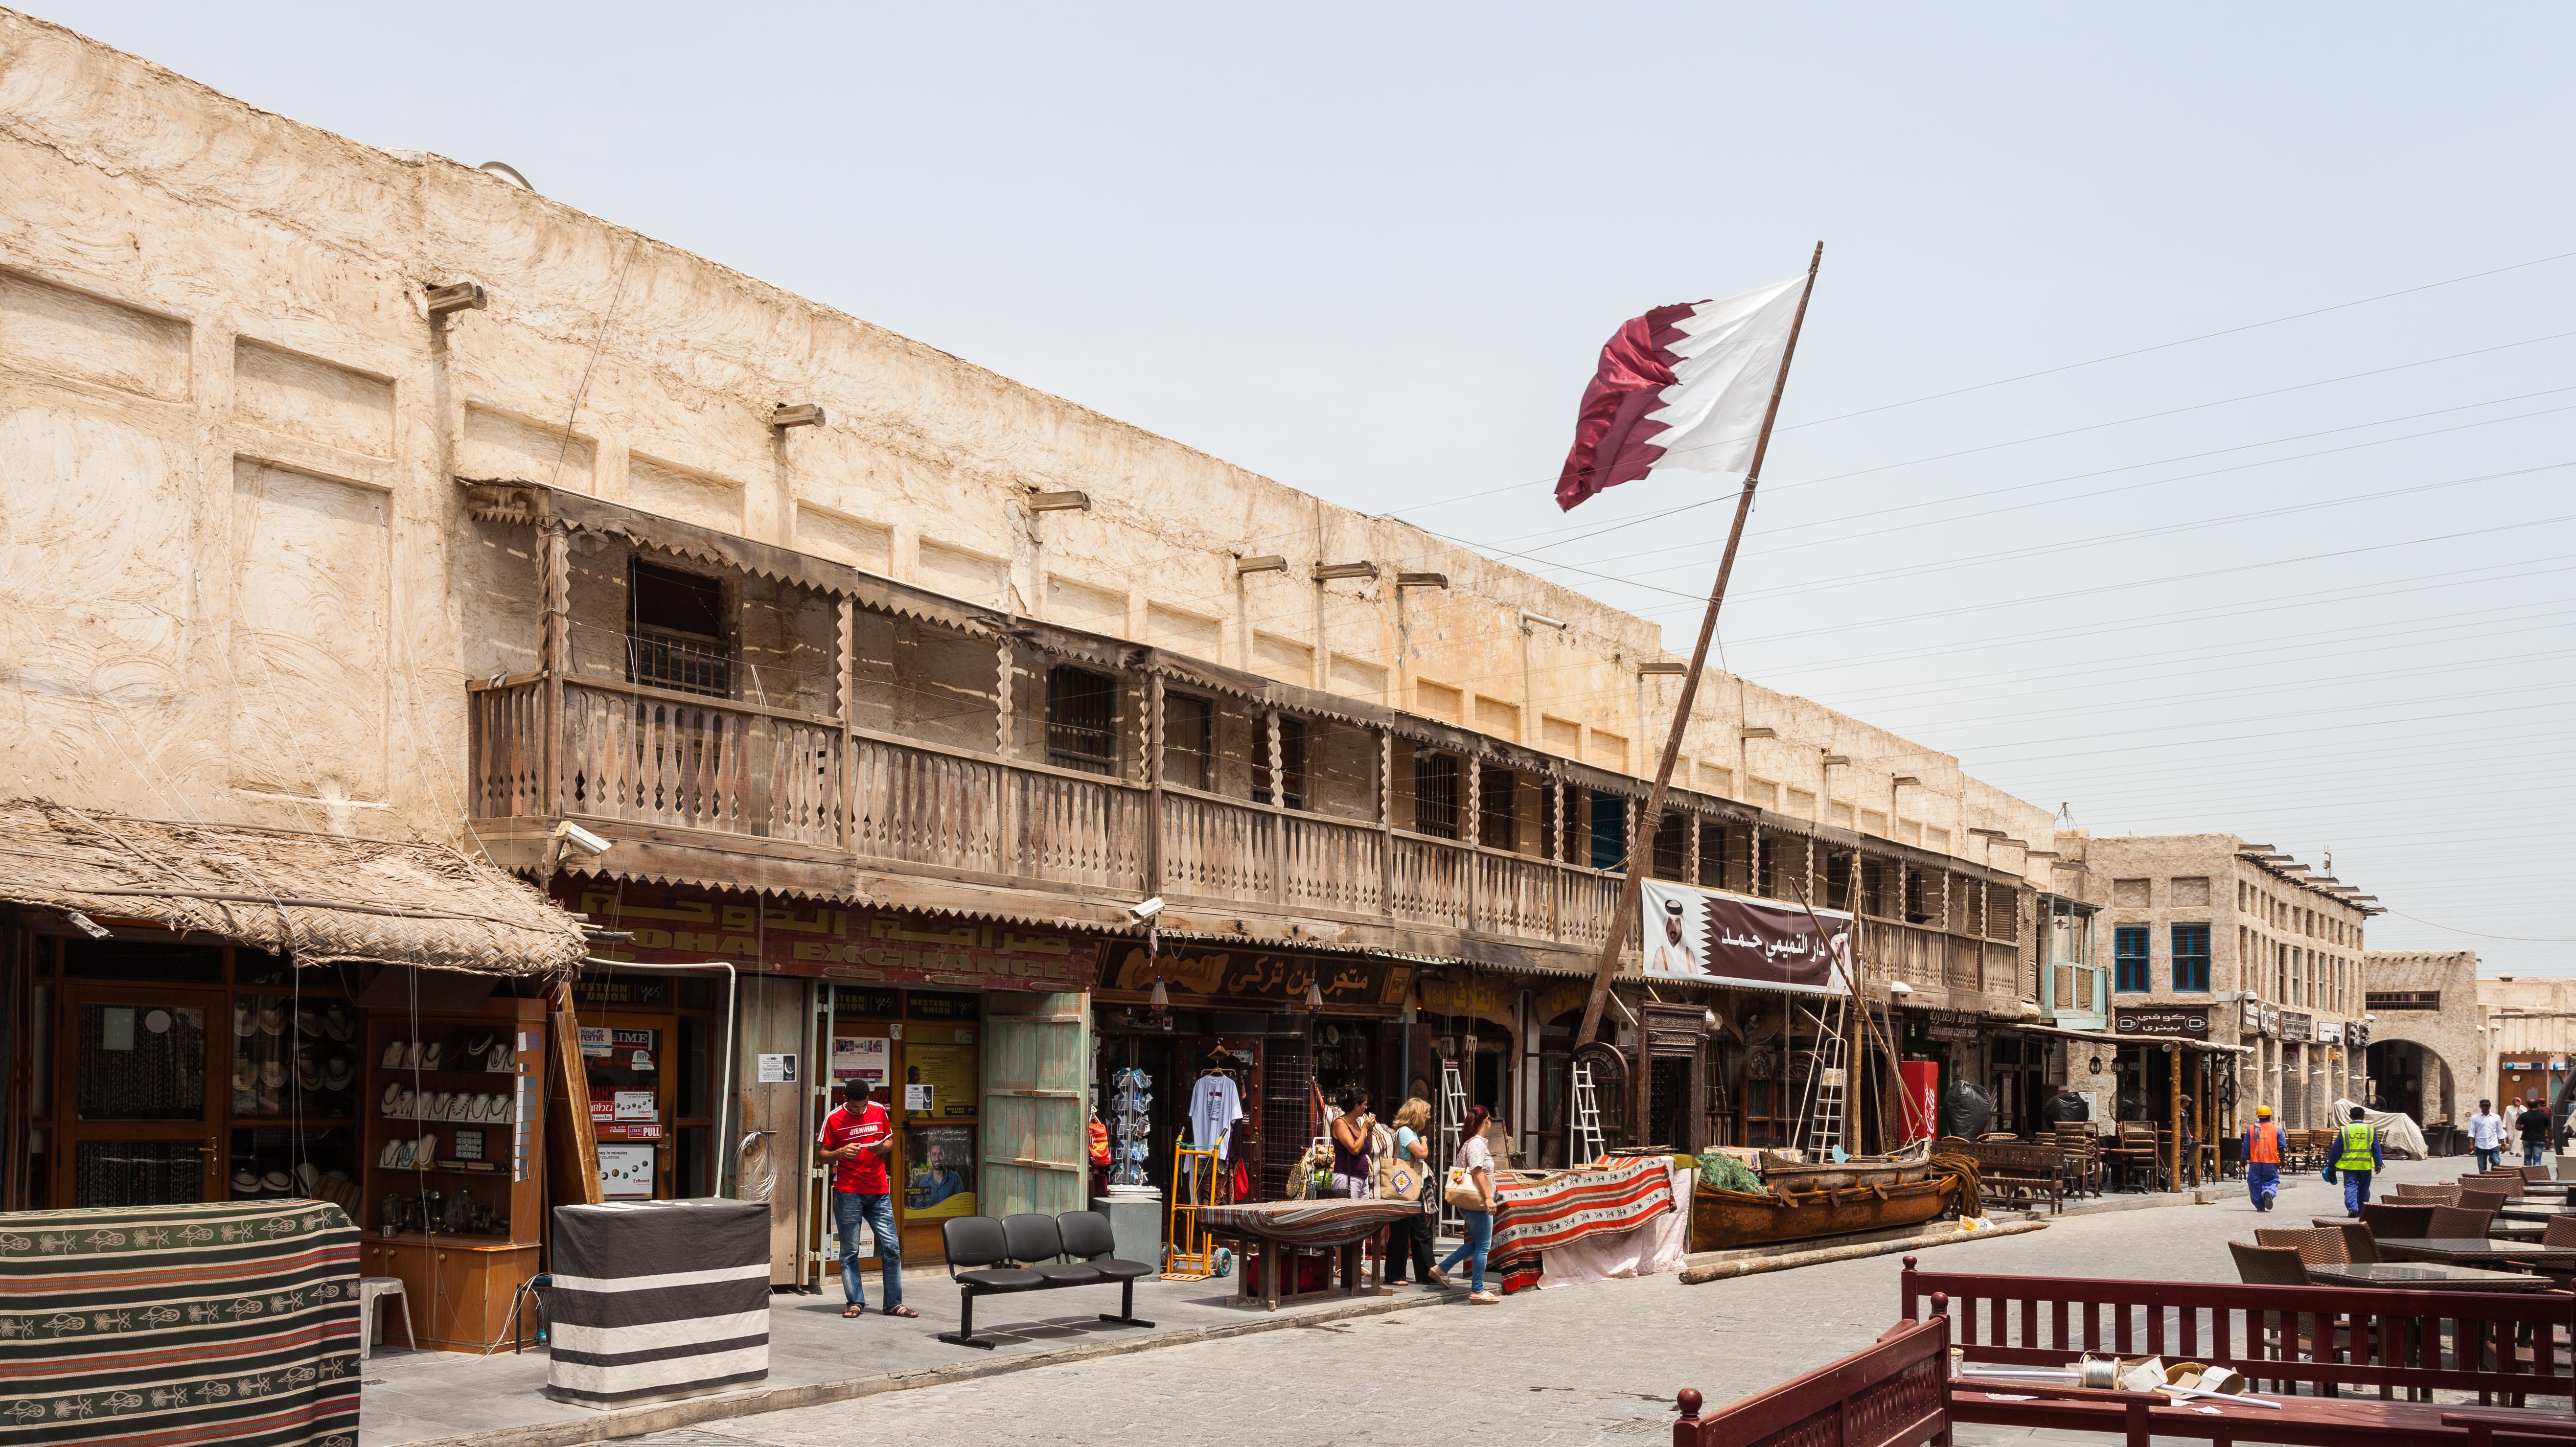 File:Souq Waqif, Doha, Catar, 2013-08-05, DD 26 JPG - Wikimedia Commons